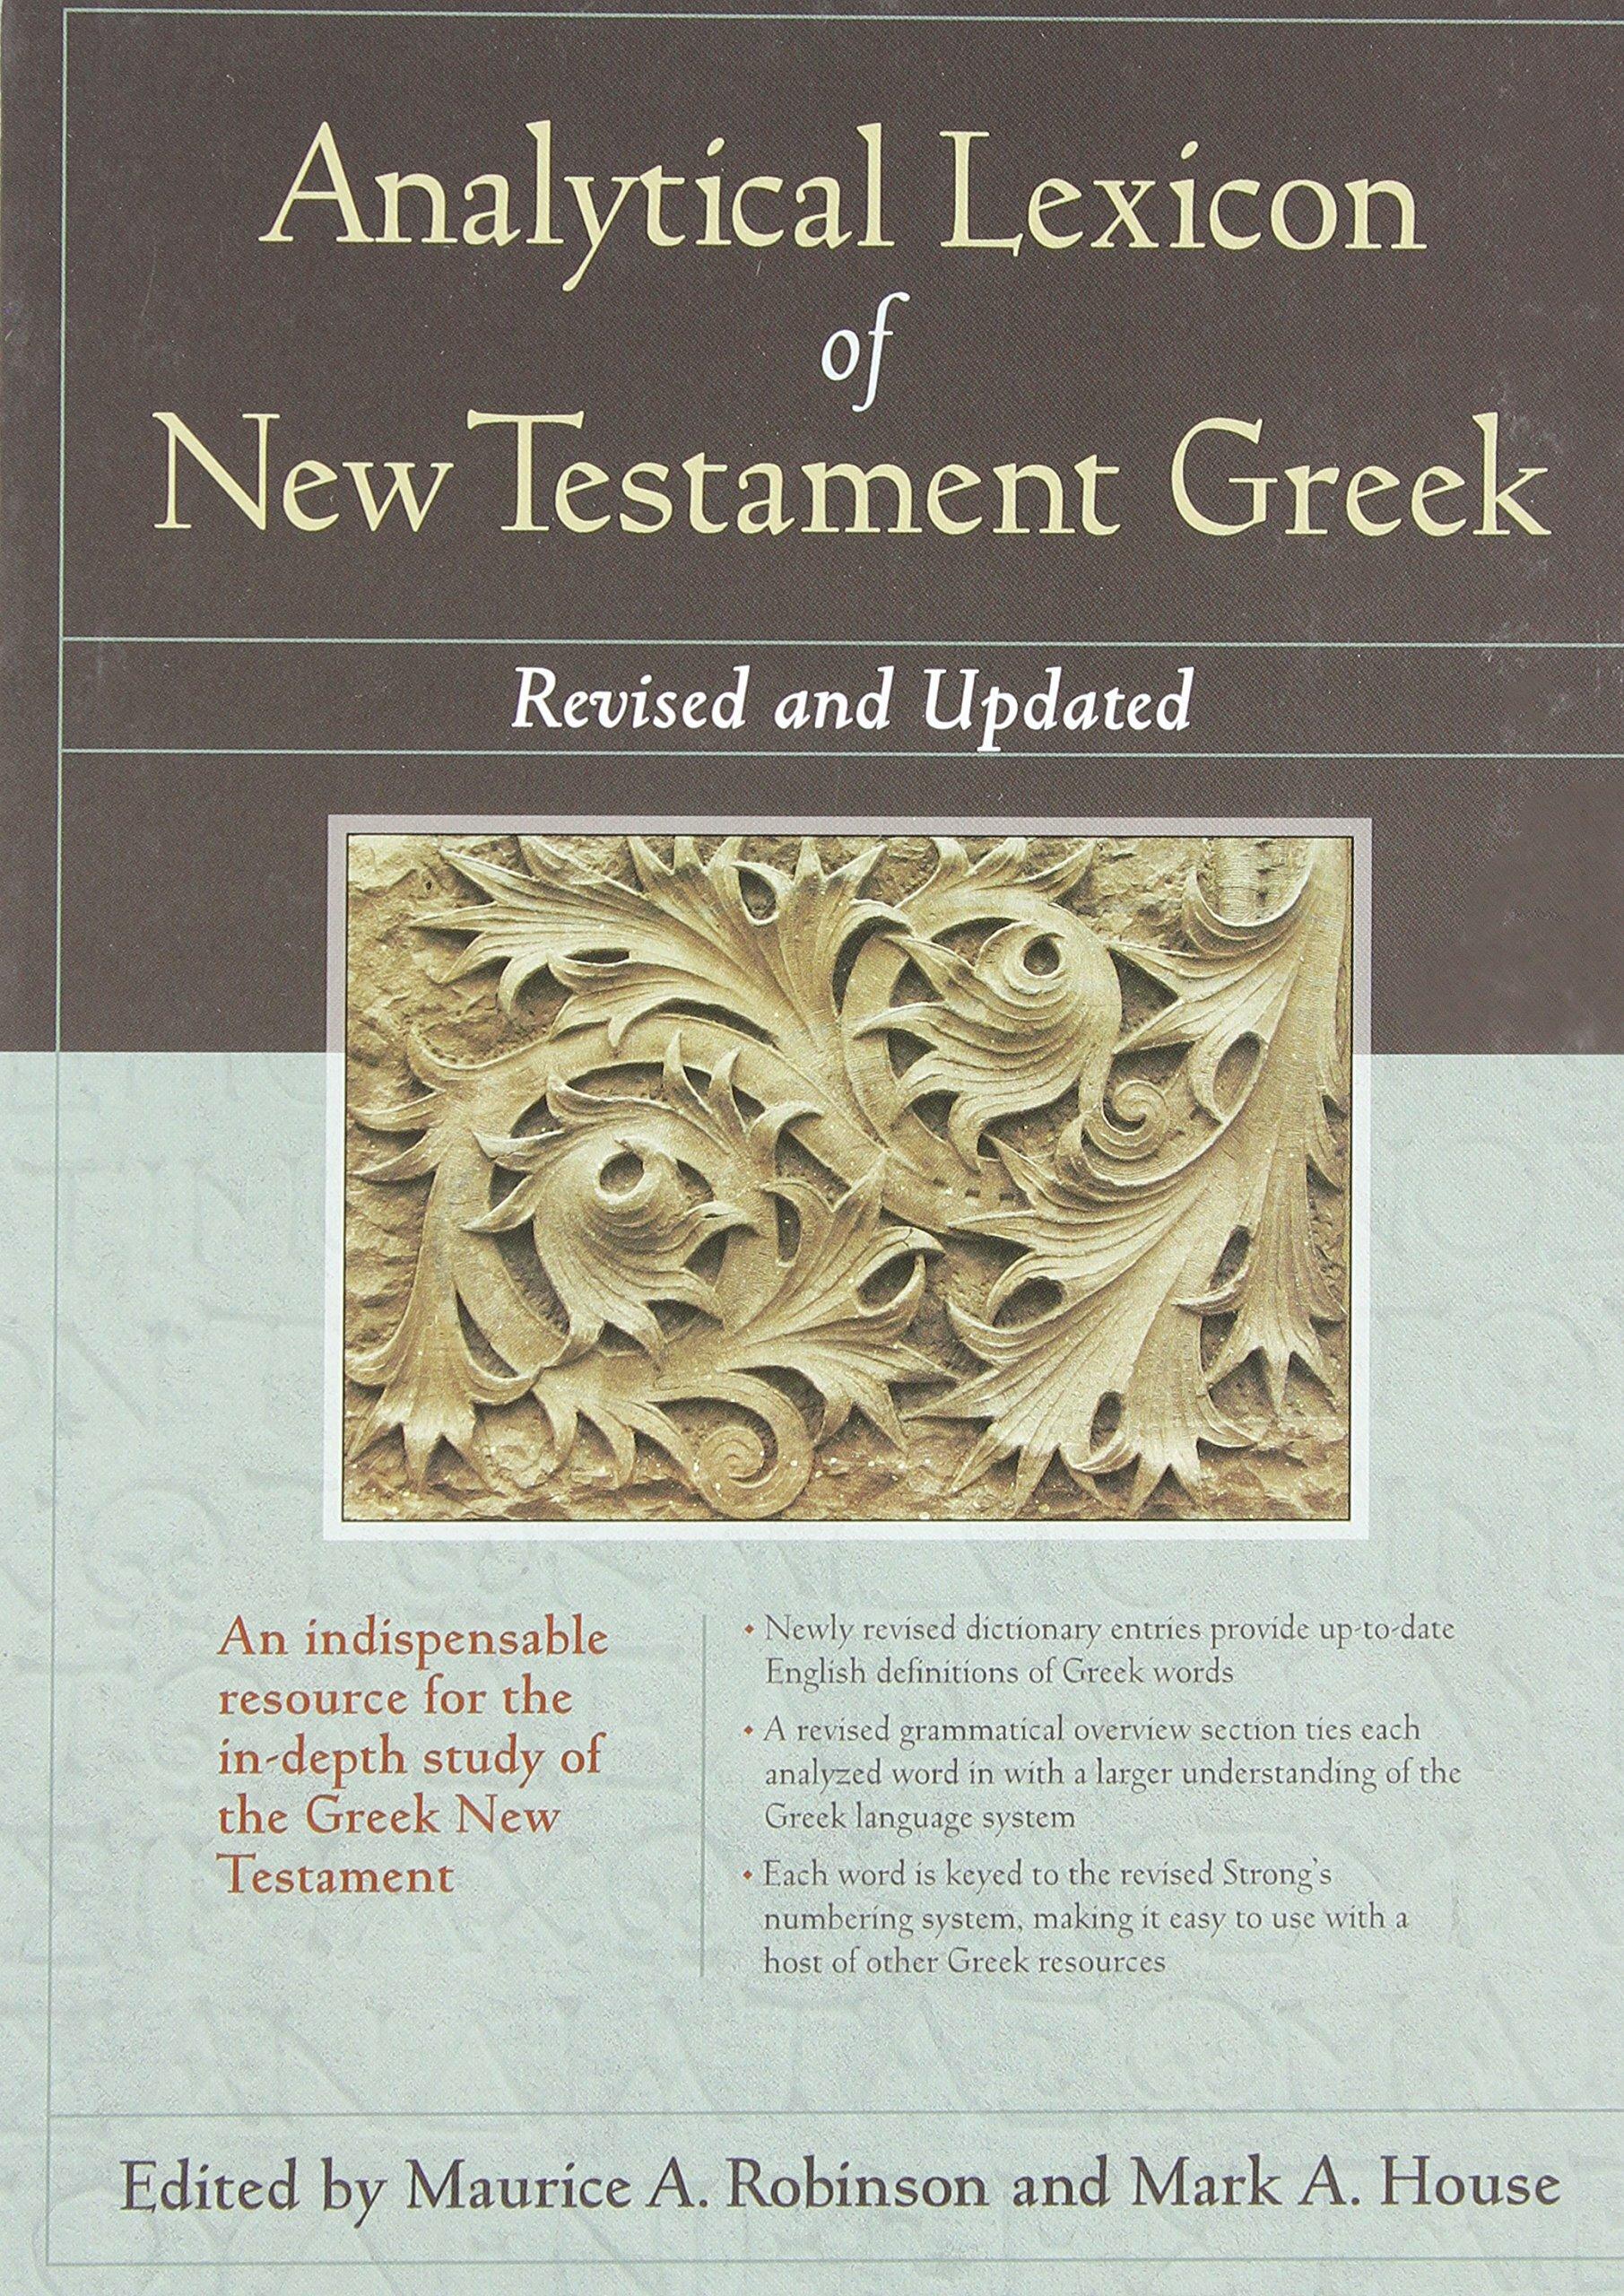 Analytical Lexicon of New Testament Greek, rev. ed.